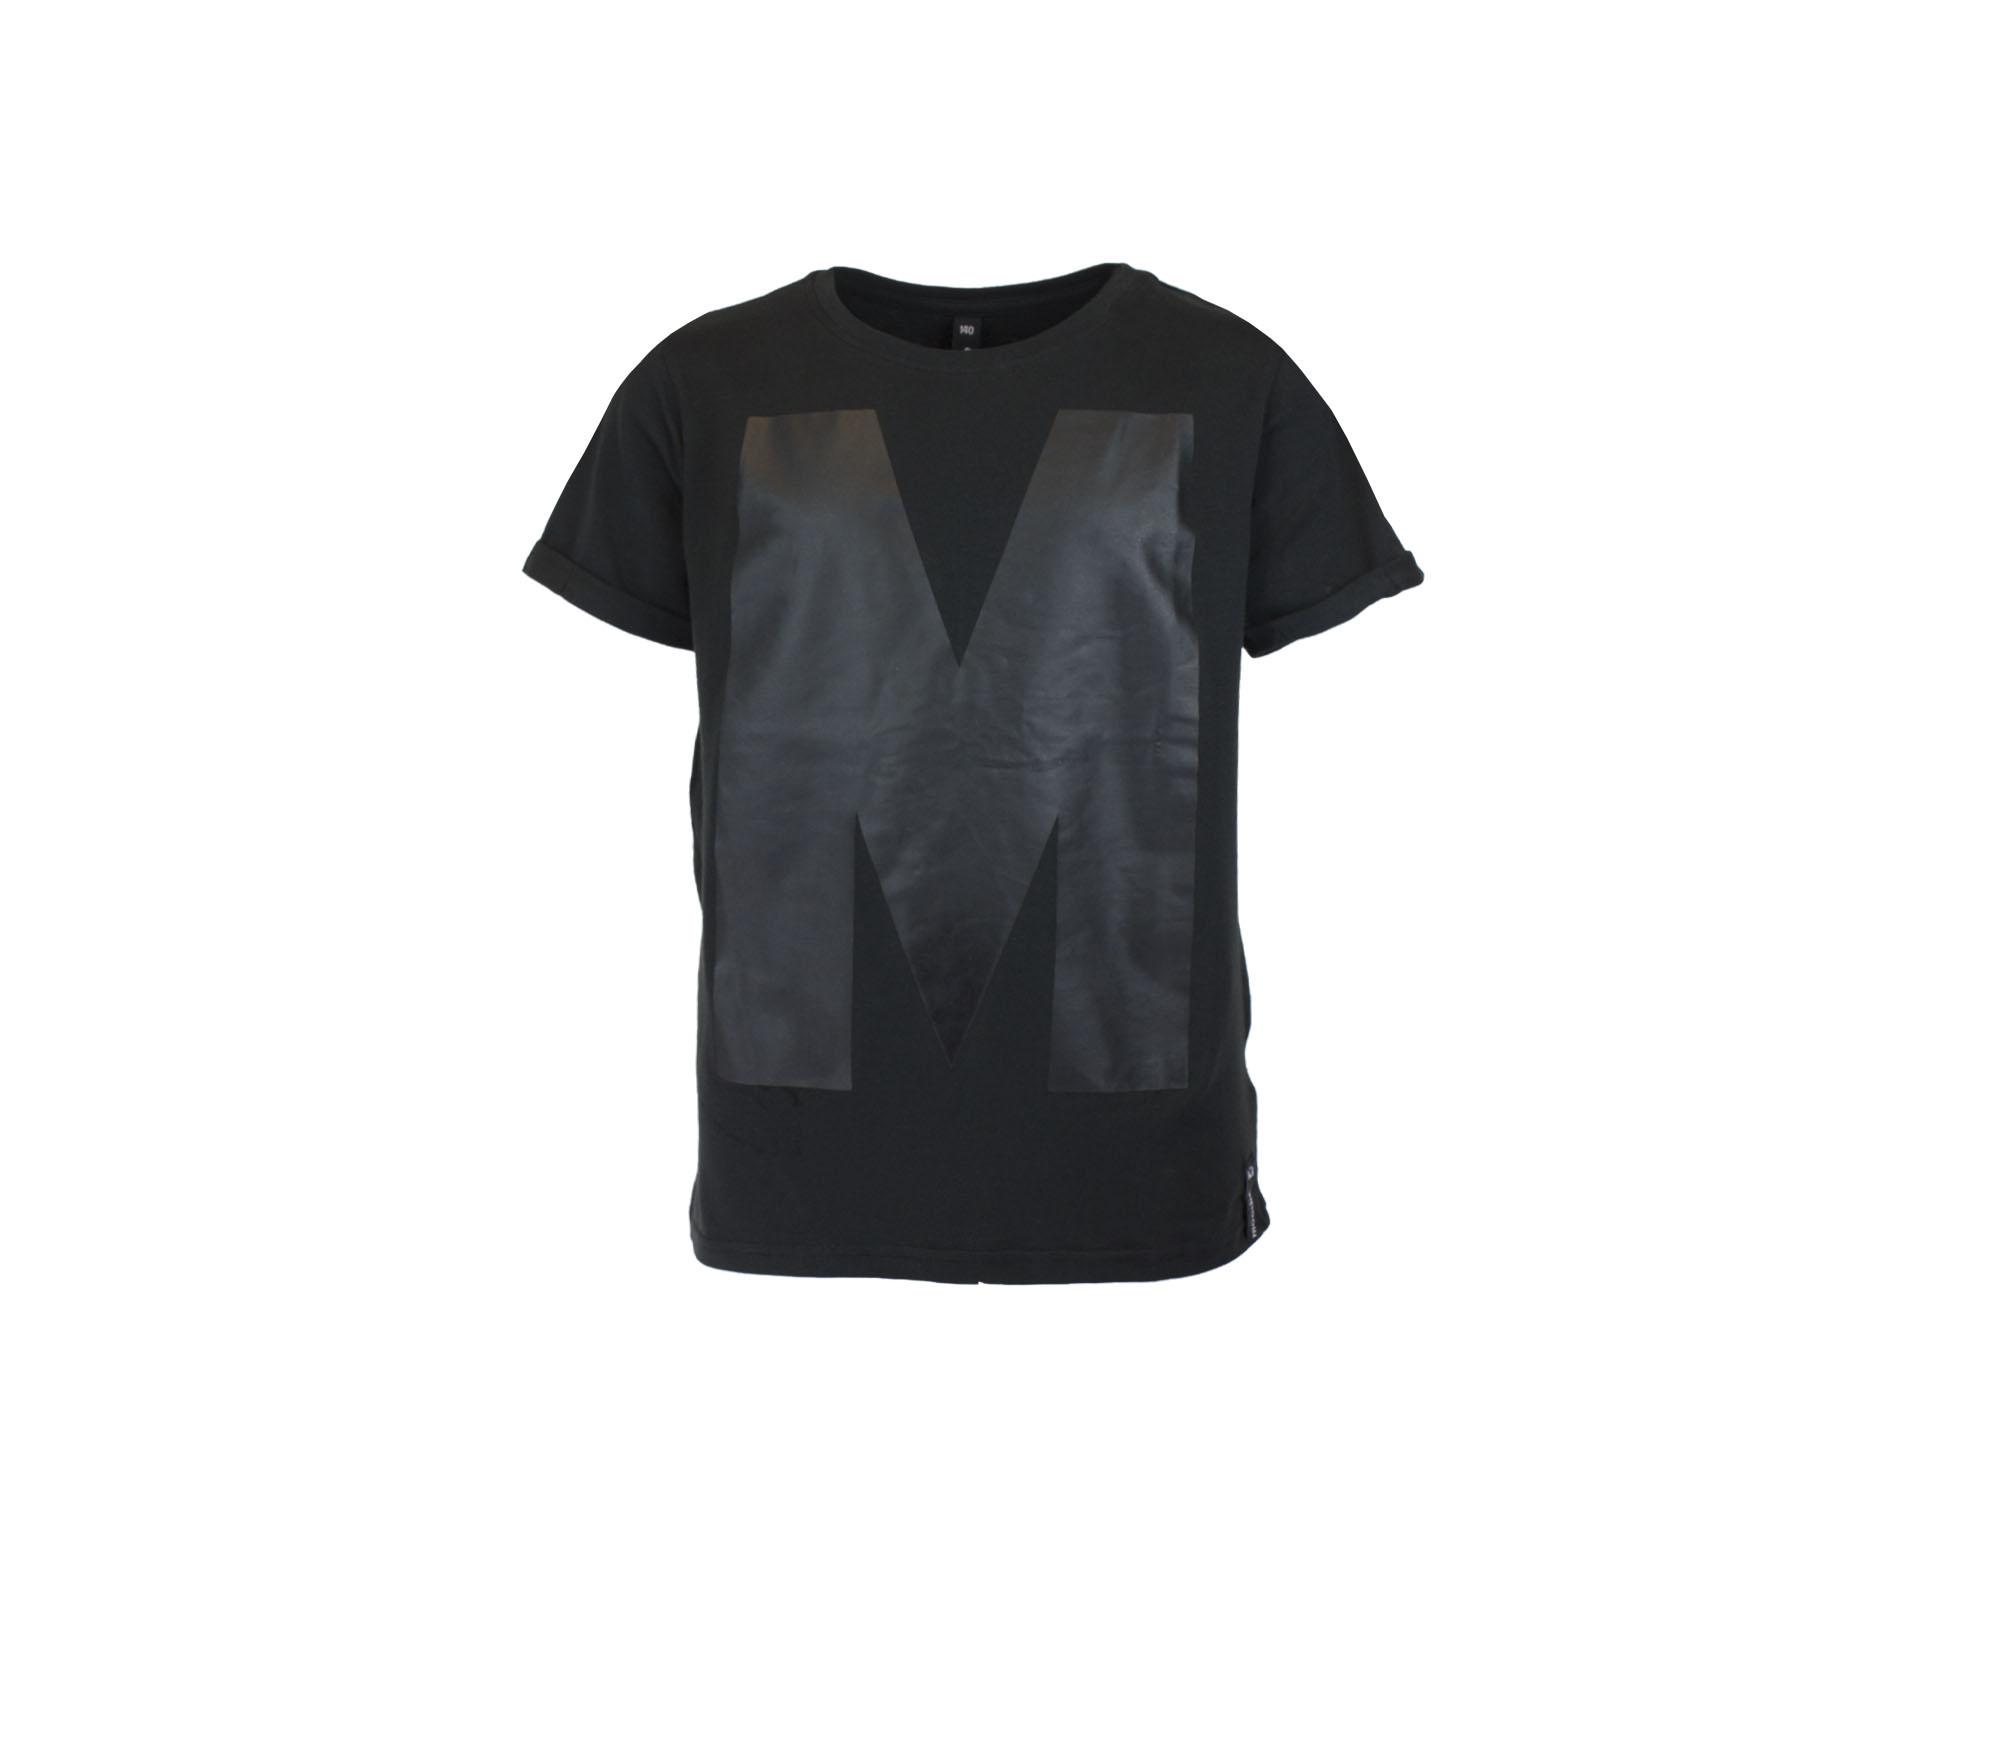 T-shirt barn svart – Mudrag